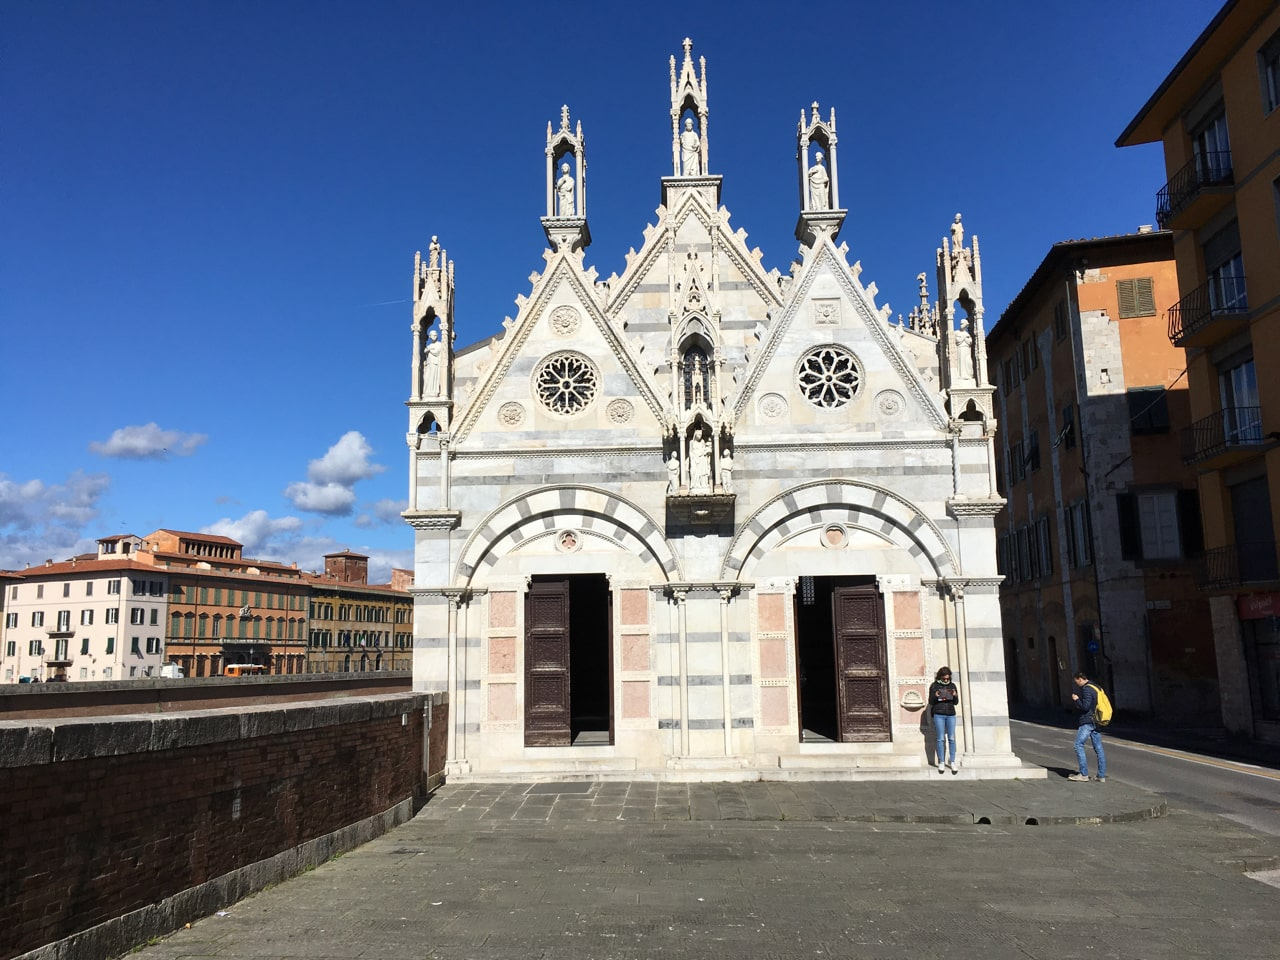 Arno河边上的一个非常袖珍的教堂,叫做圣母玛利亚斯皮那教堂(Chiesa di Santa Maria della Spina),可以免费进入参观